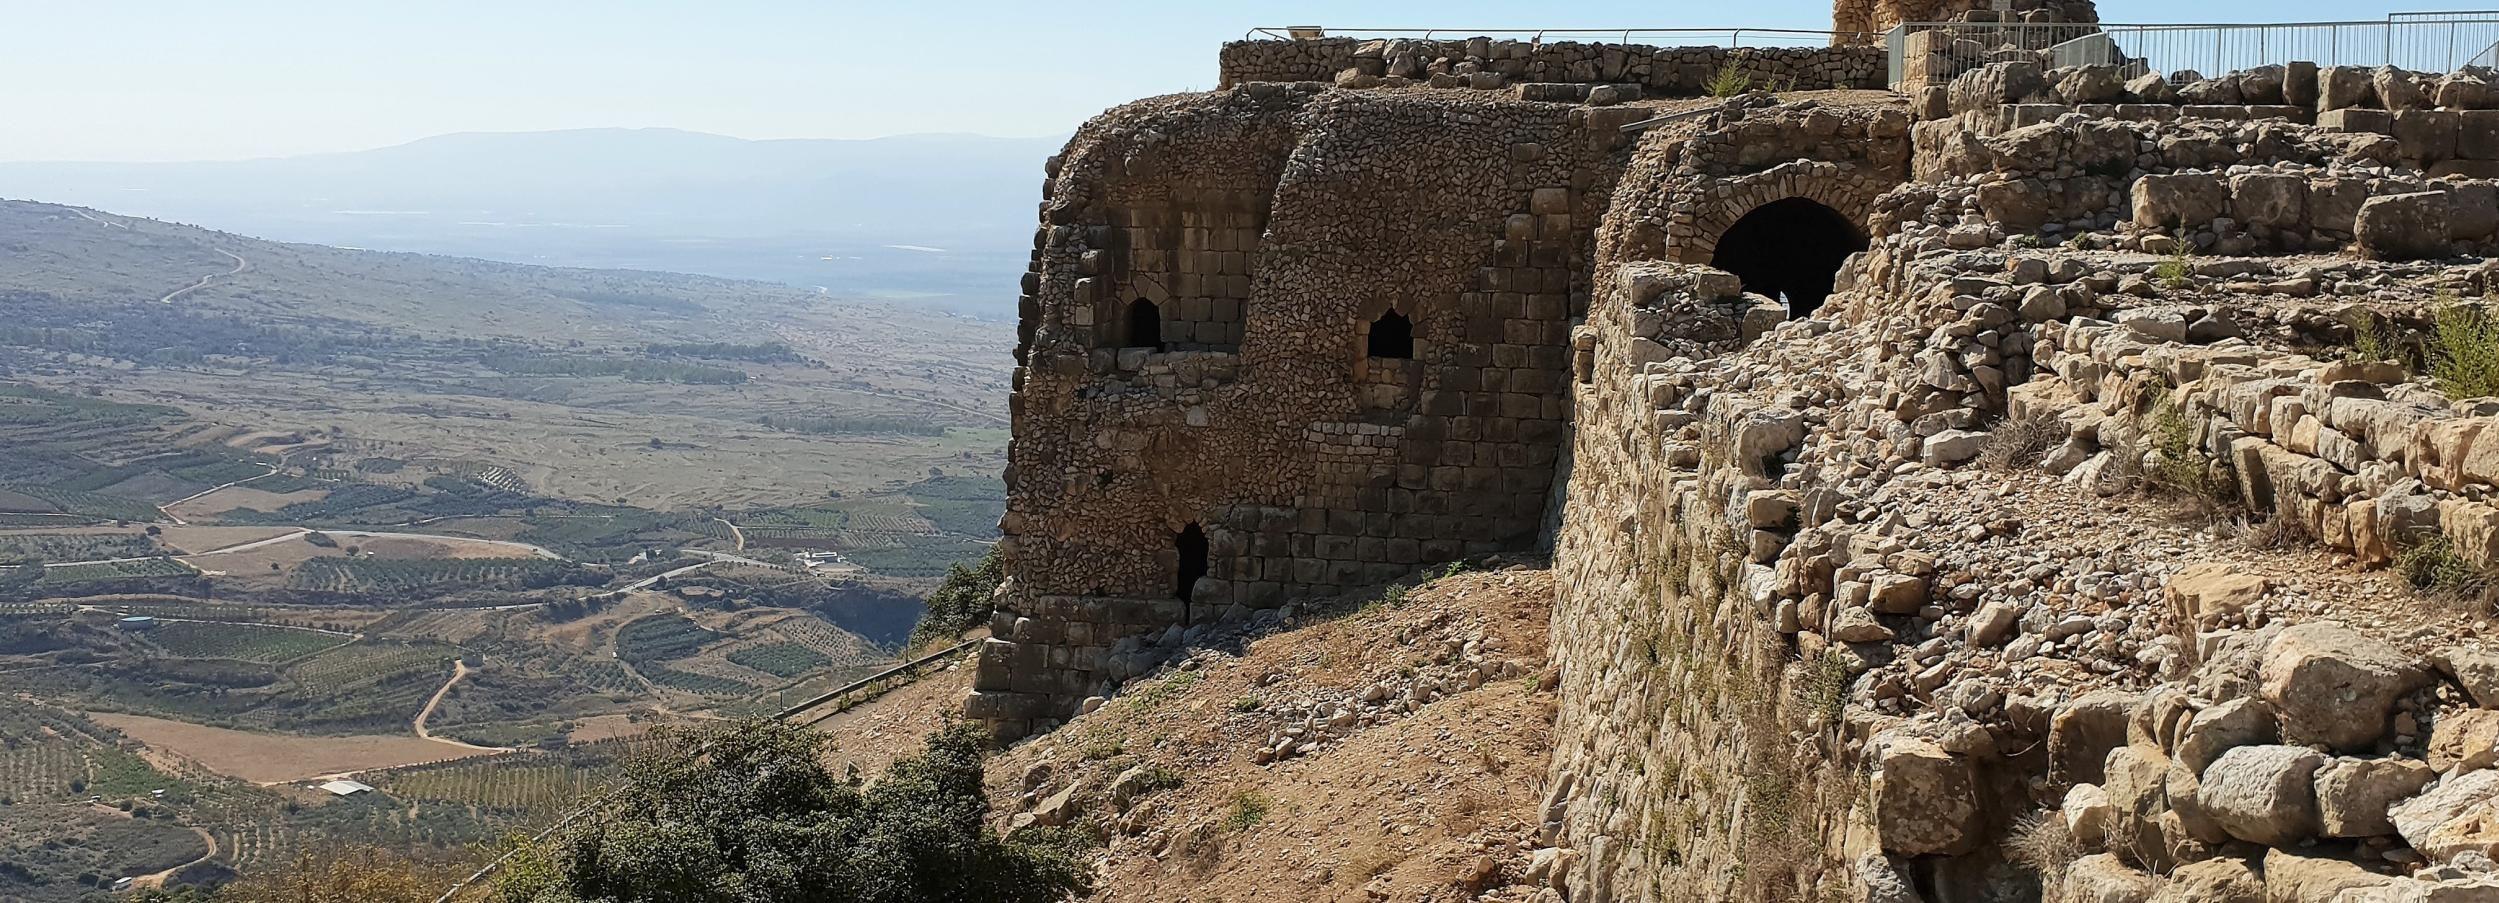 Da Tel Aviv: tour guidato privato di Banias & Golan Heights